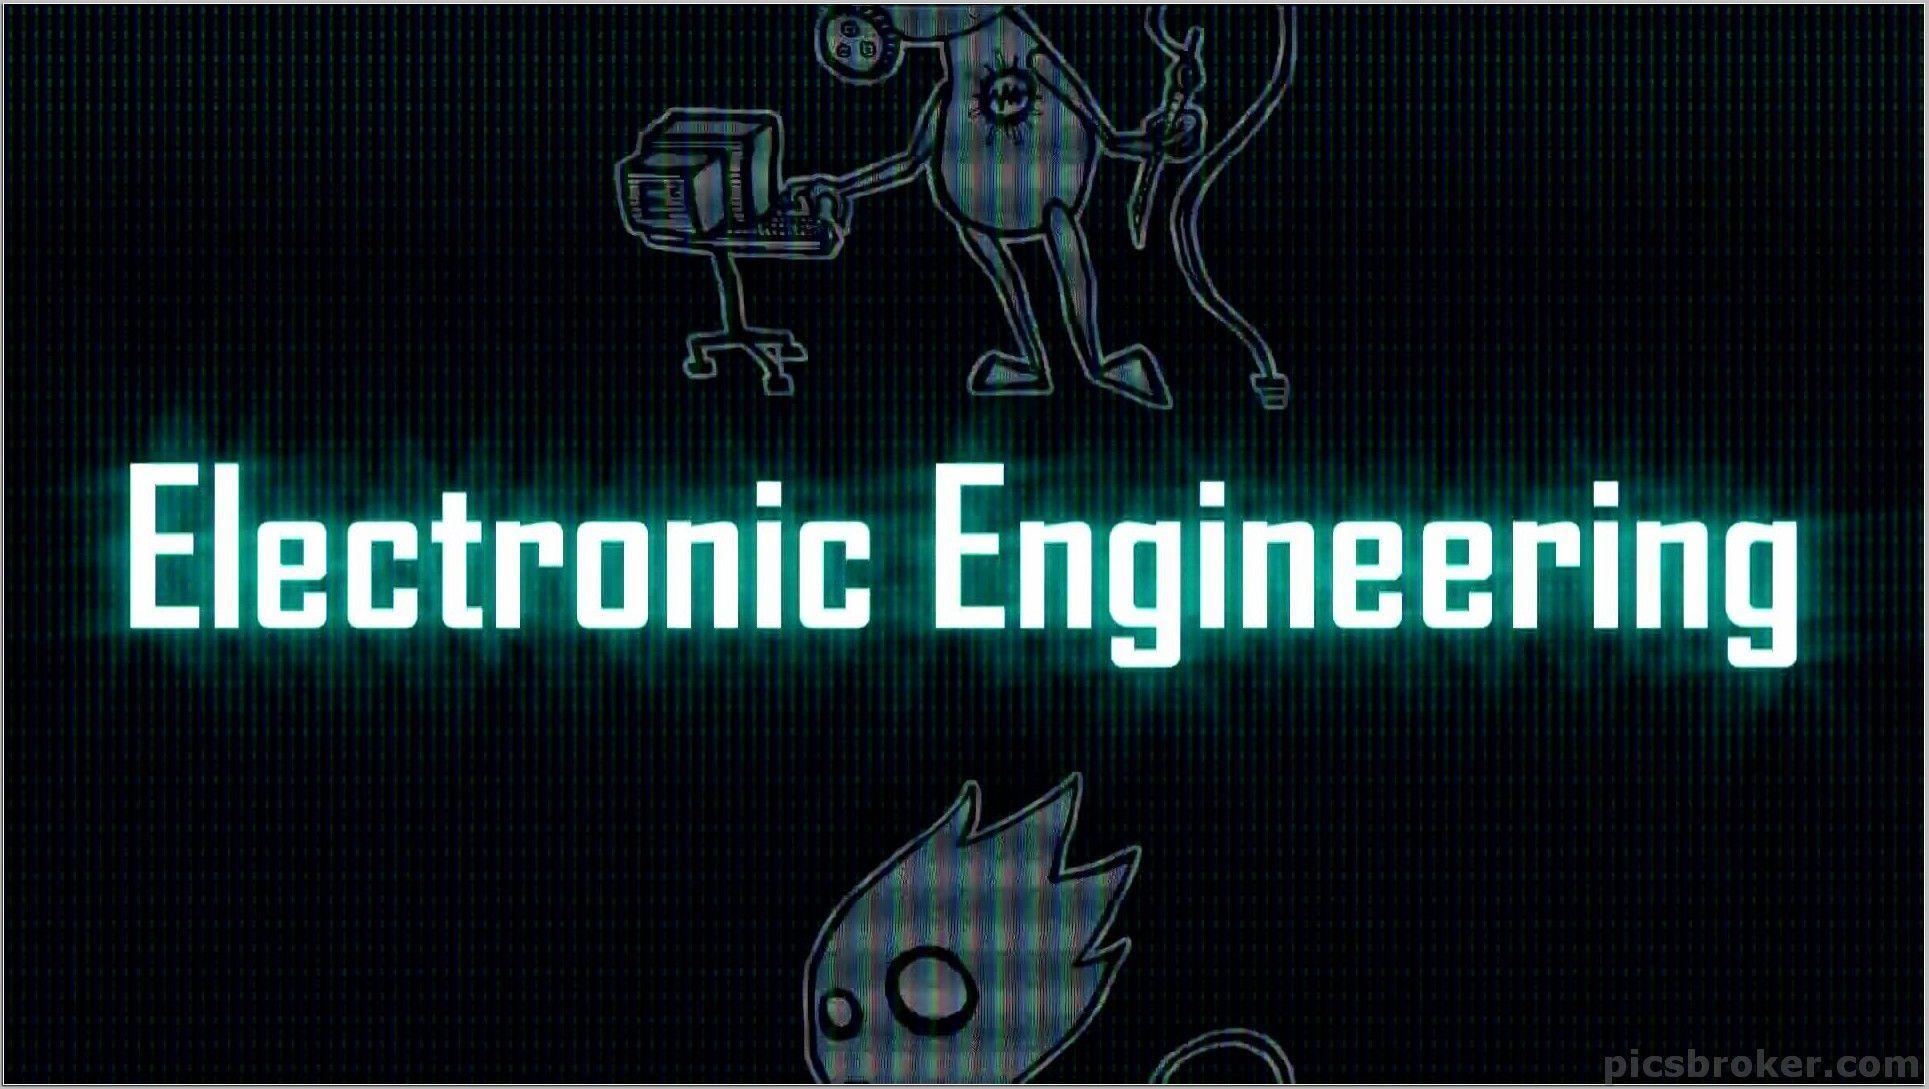 Electrical Engineering...